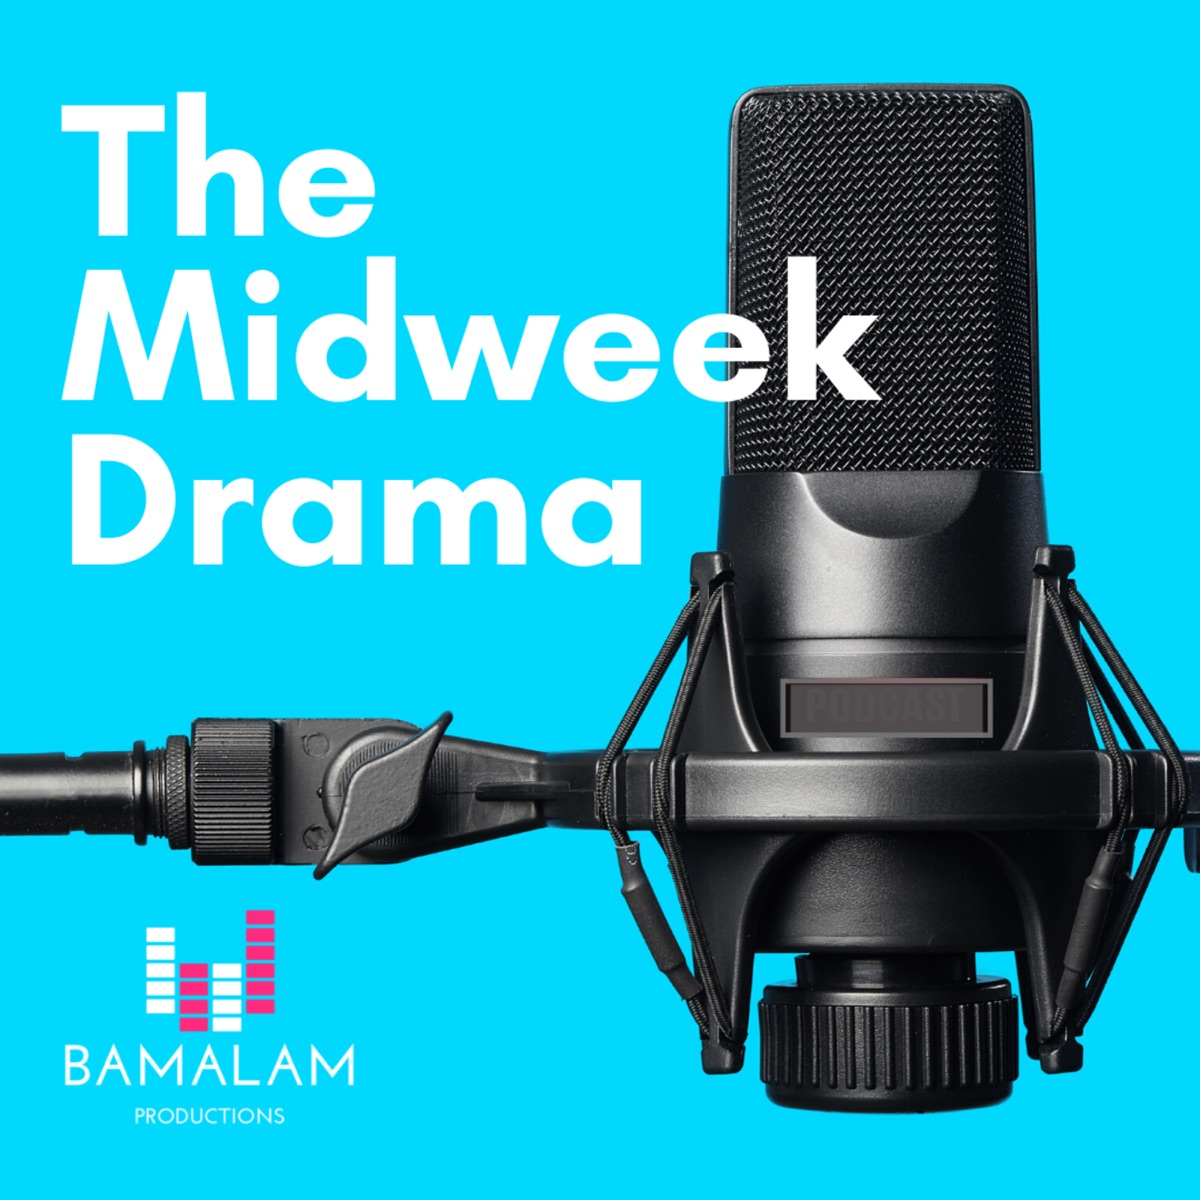 The Midweek Drama